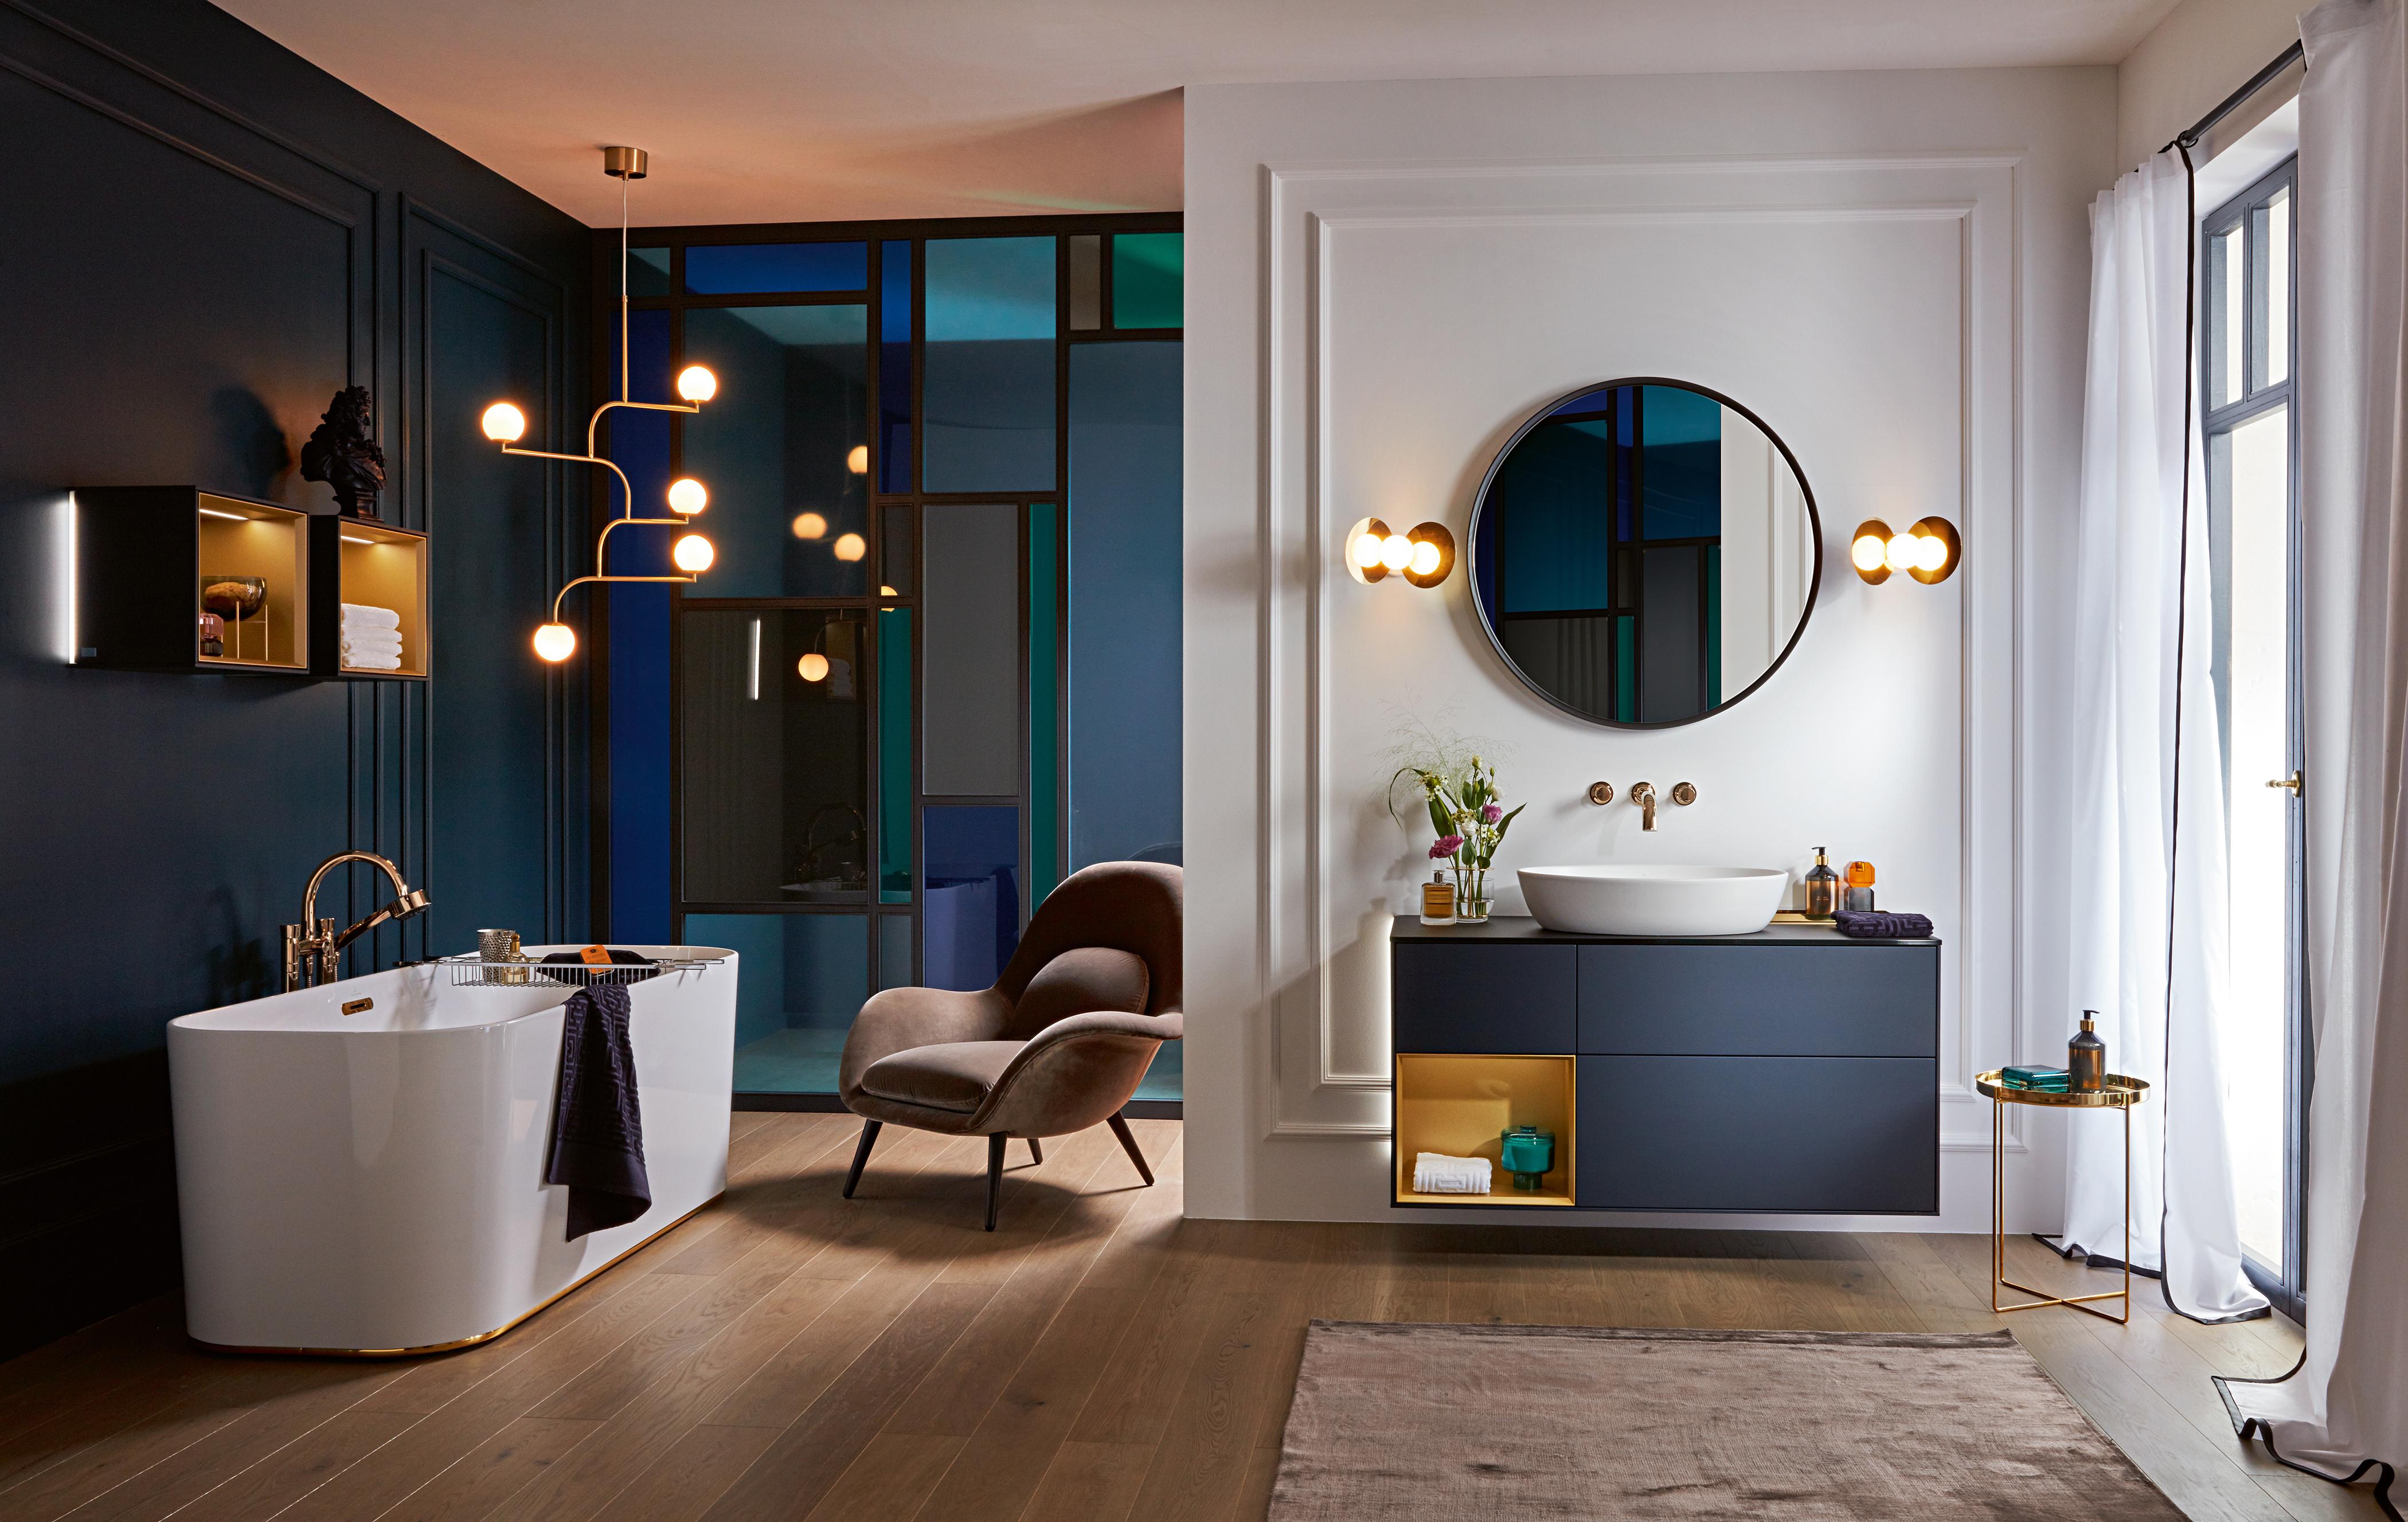 1 - Finion - Freestanding Bath